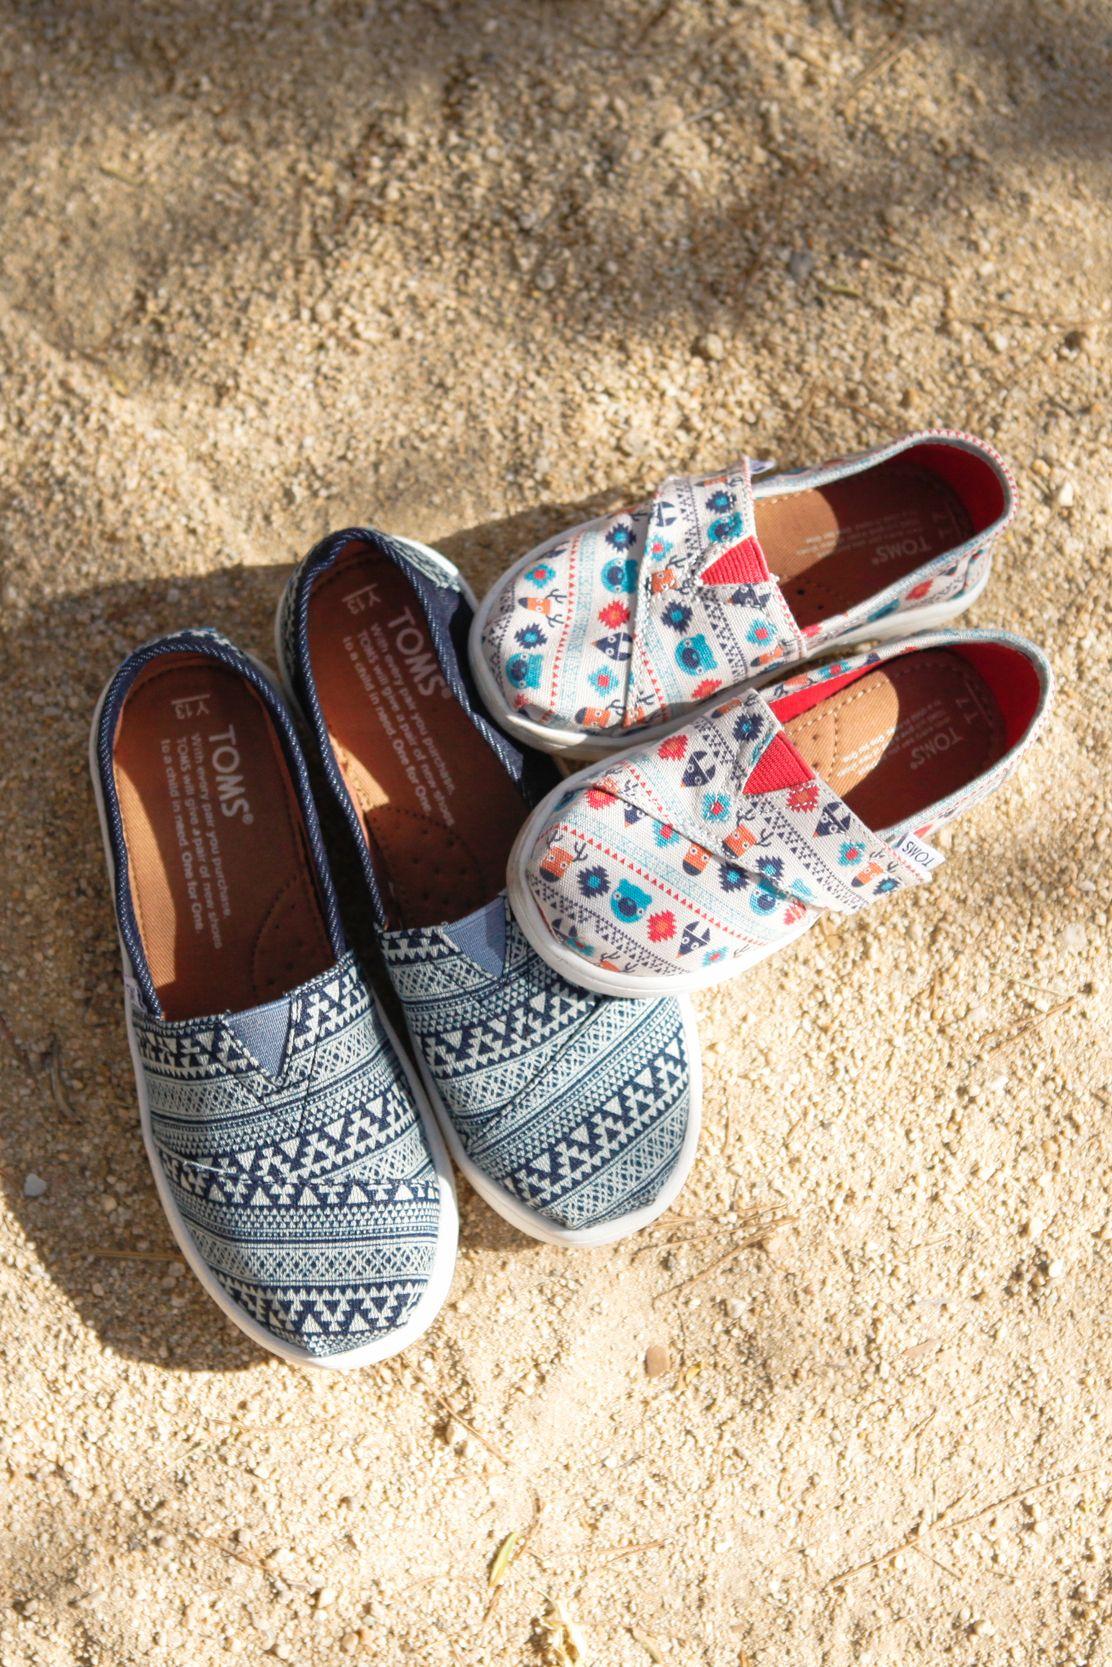 Toms shoes, Tiny toms